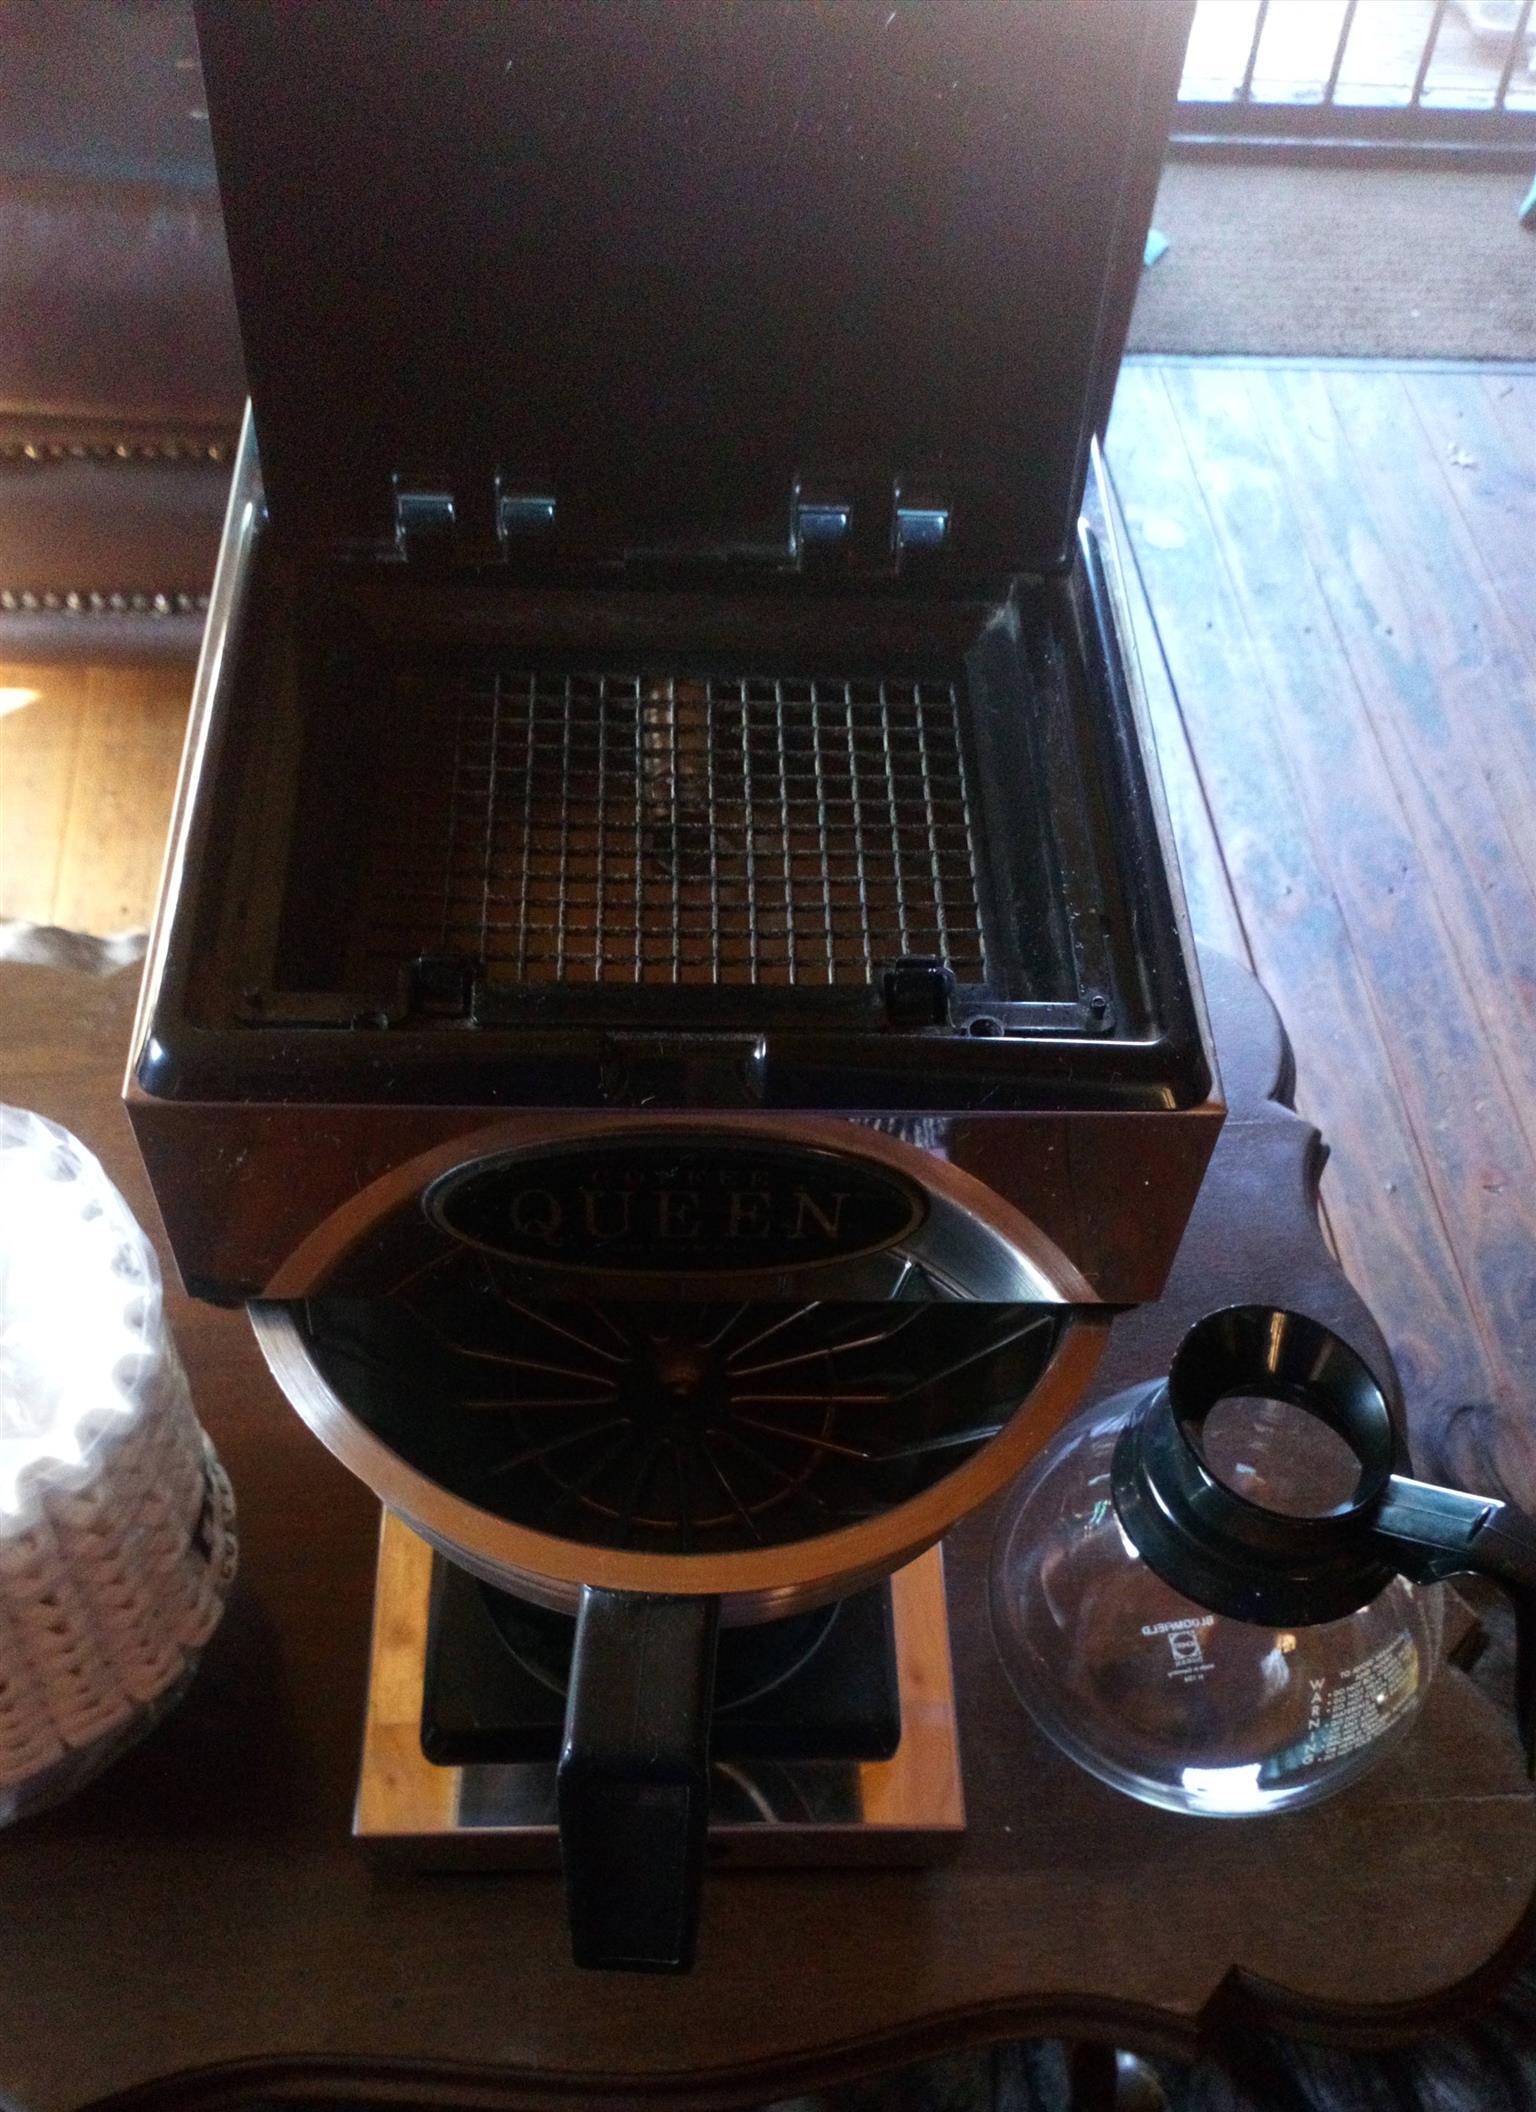 Coffee Queen coffee machine